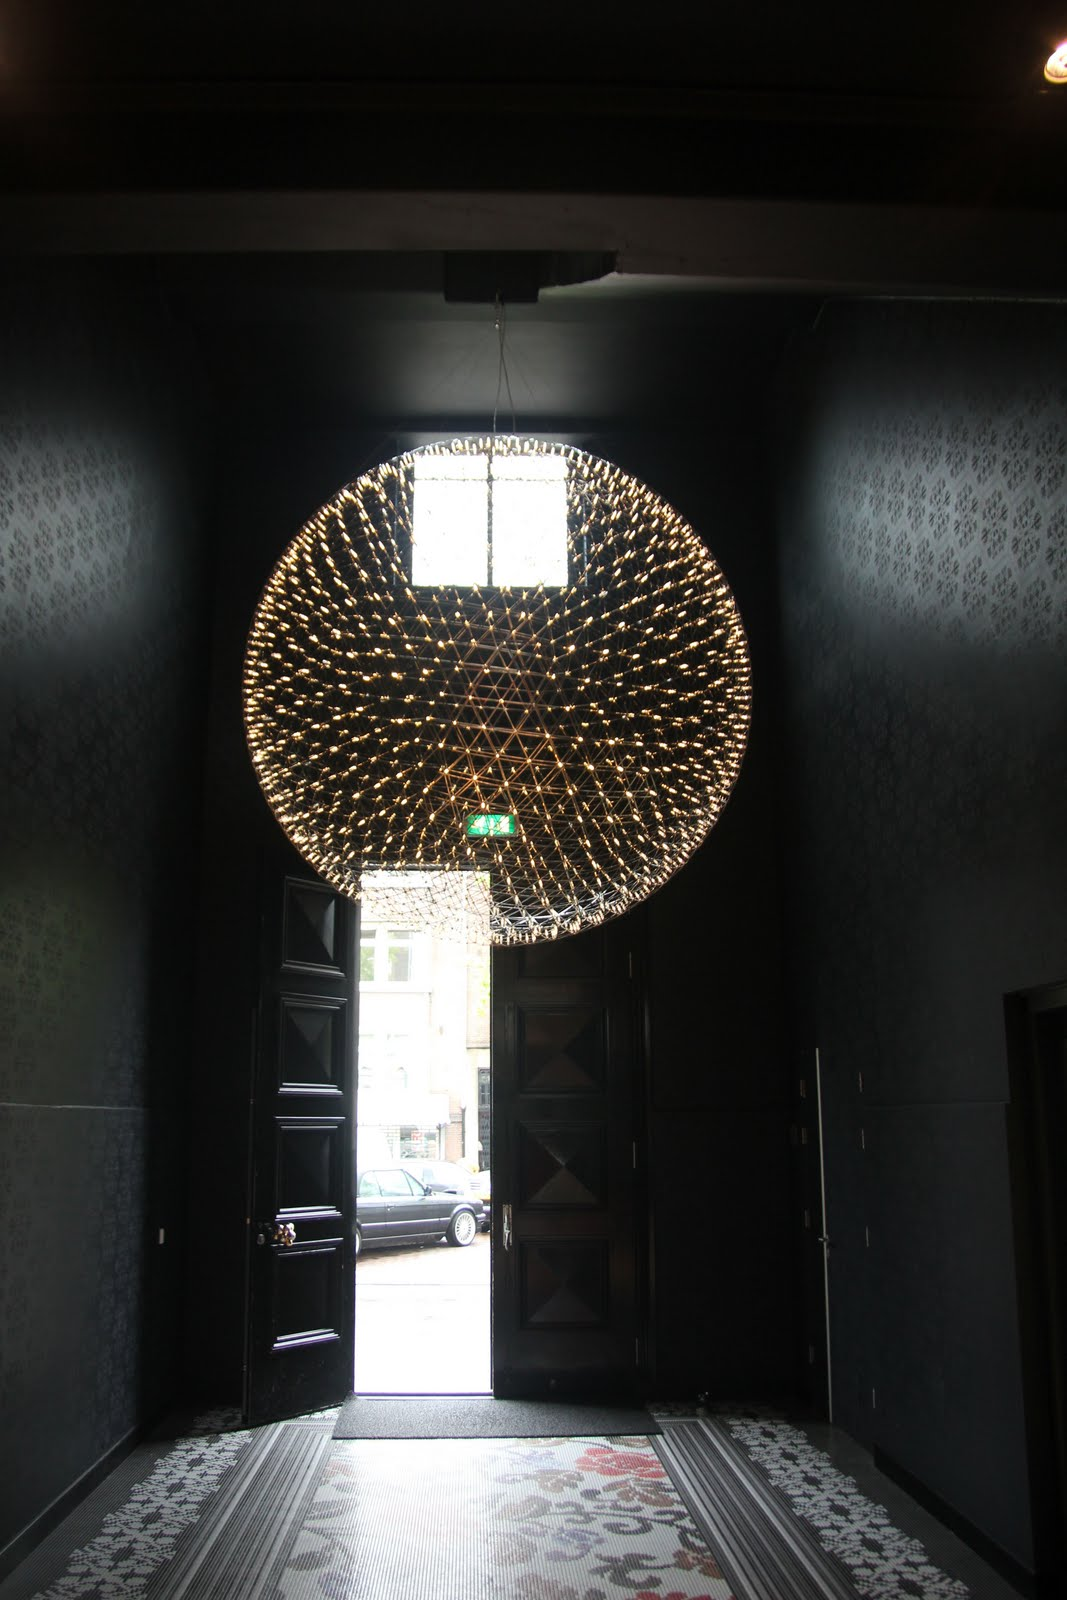 raimond pendant from moooi lighting. Black Bedroom Furniture Sets. Home Design Ideas